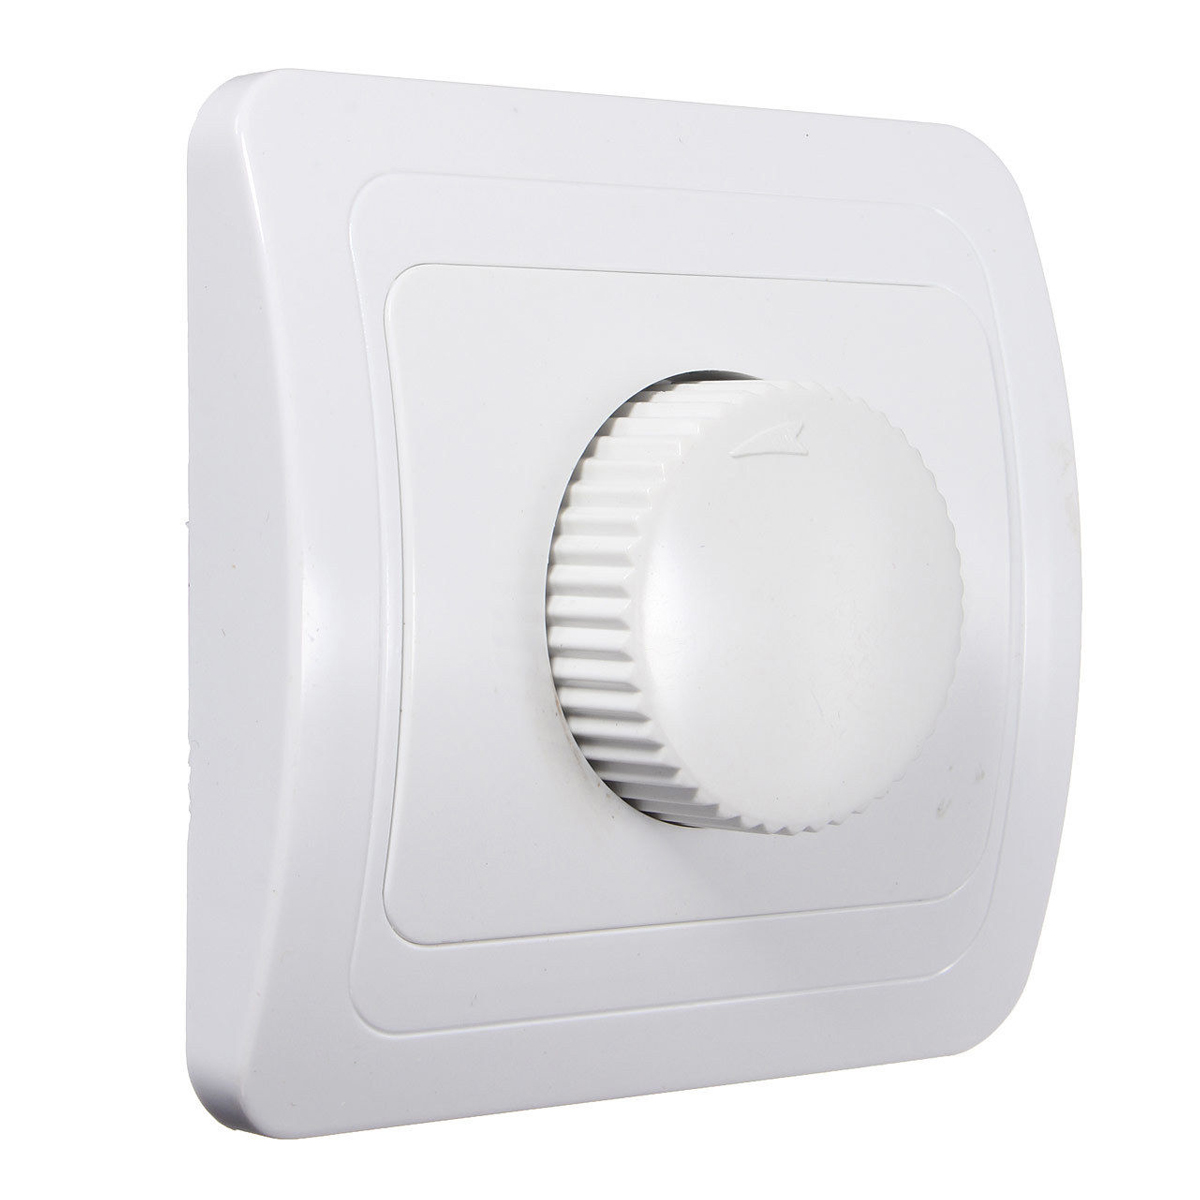 Hot sale110V / 220V Adjustable Controller Dimmer Switch For Dimmable Light Bulb Lamp White